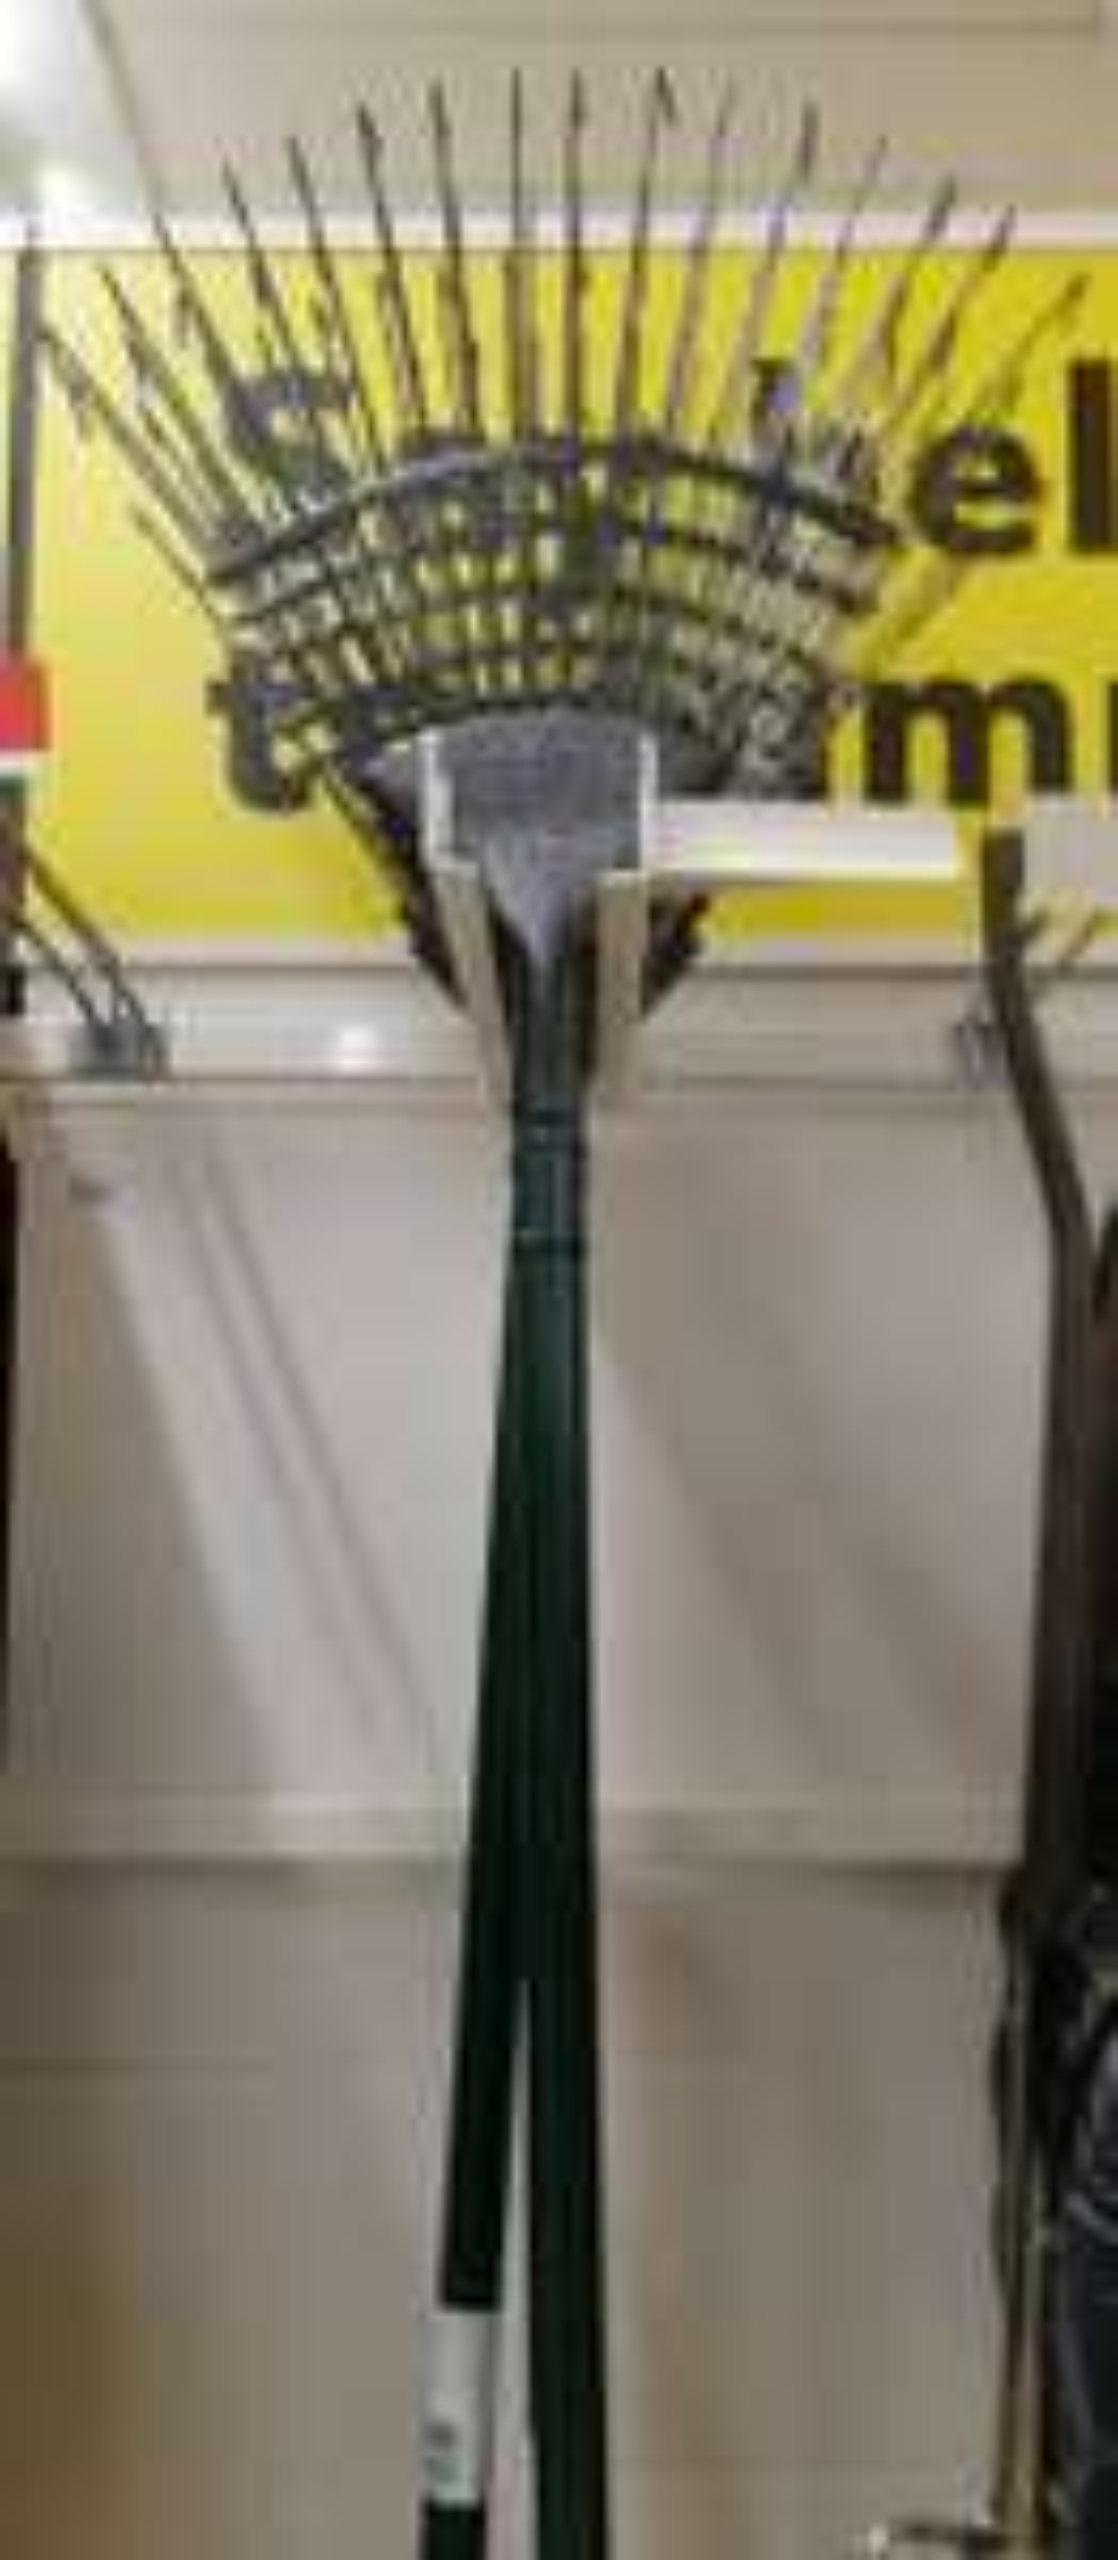 All metal Leaf rake for £1.50 at Sainsburys instore